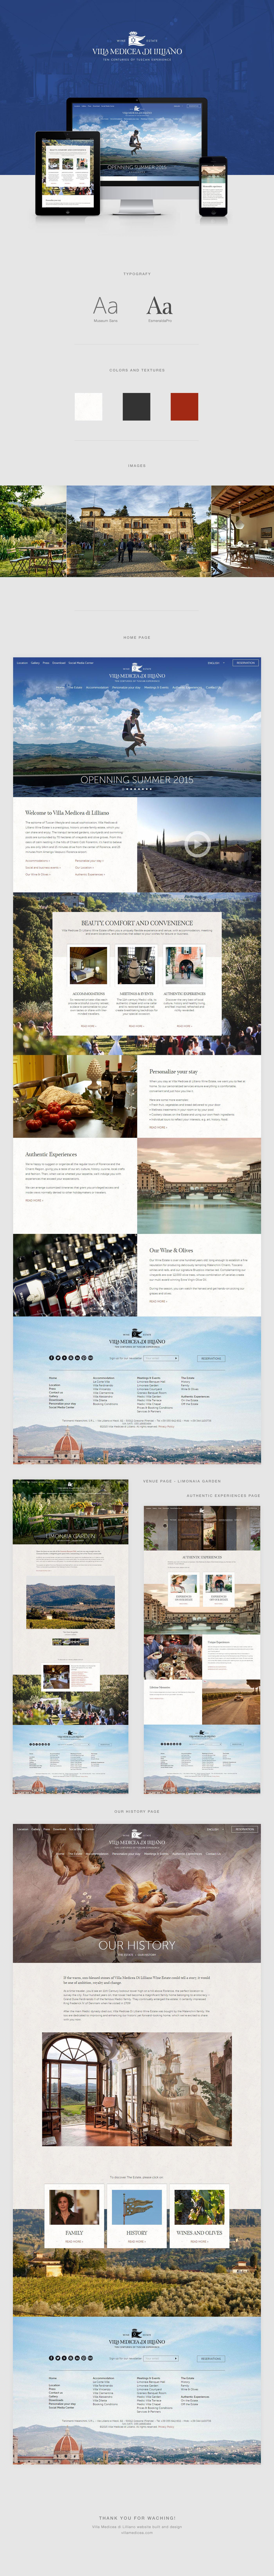 Web,Website,villamedicea,Florence,Italy,Villa